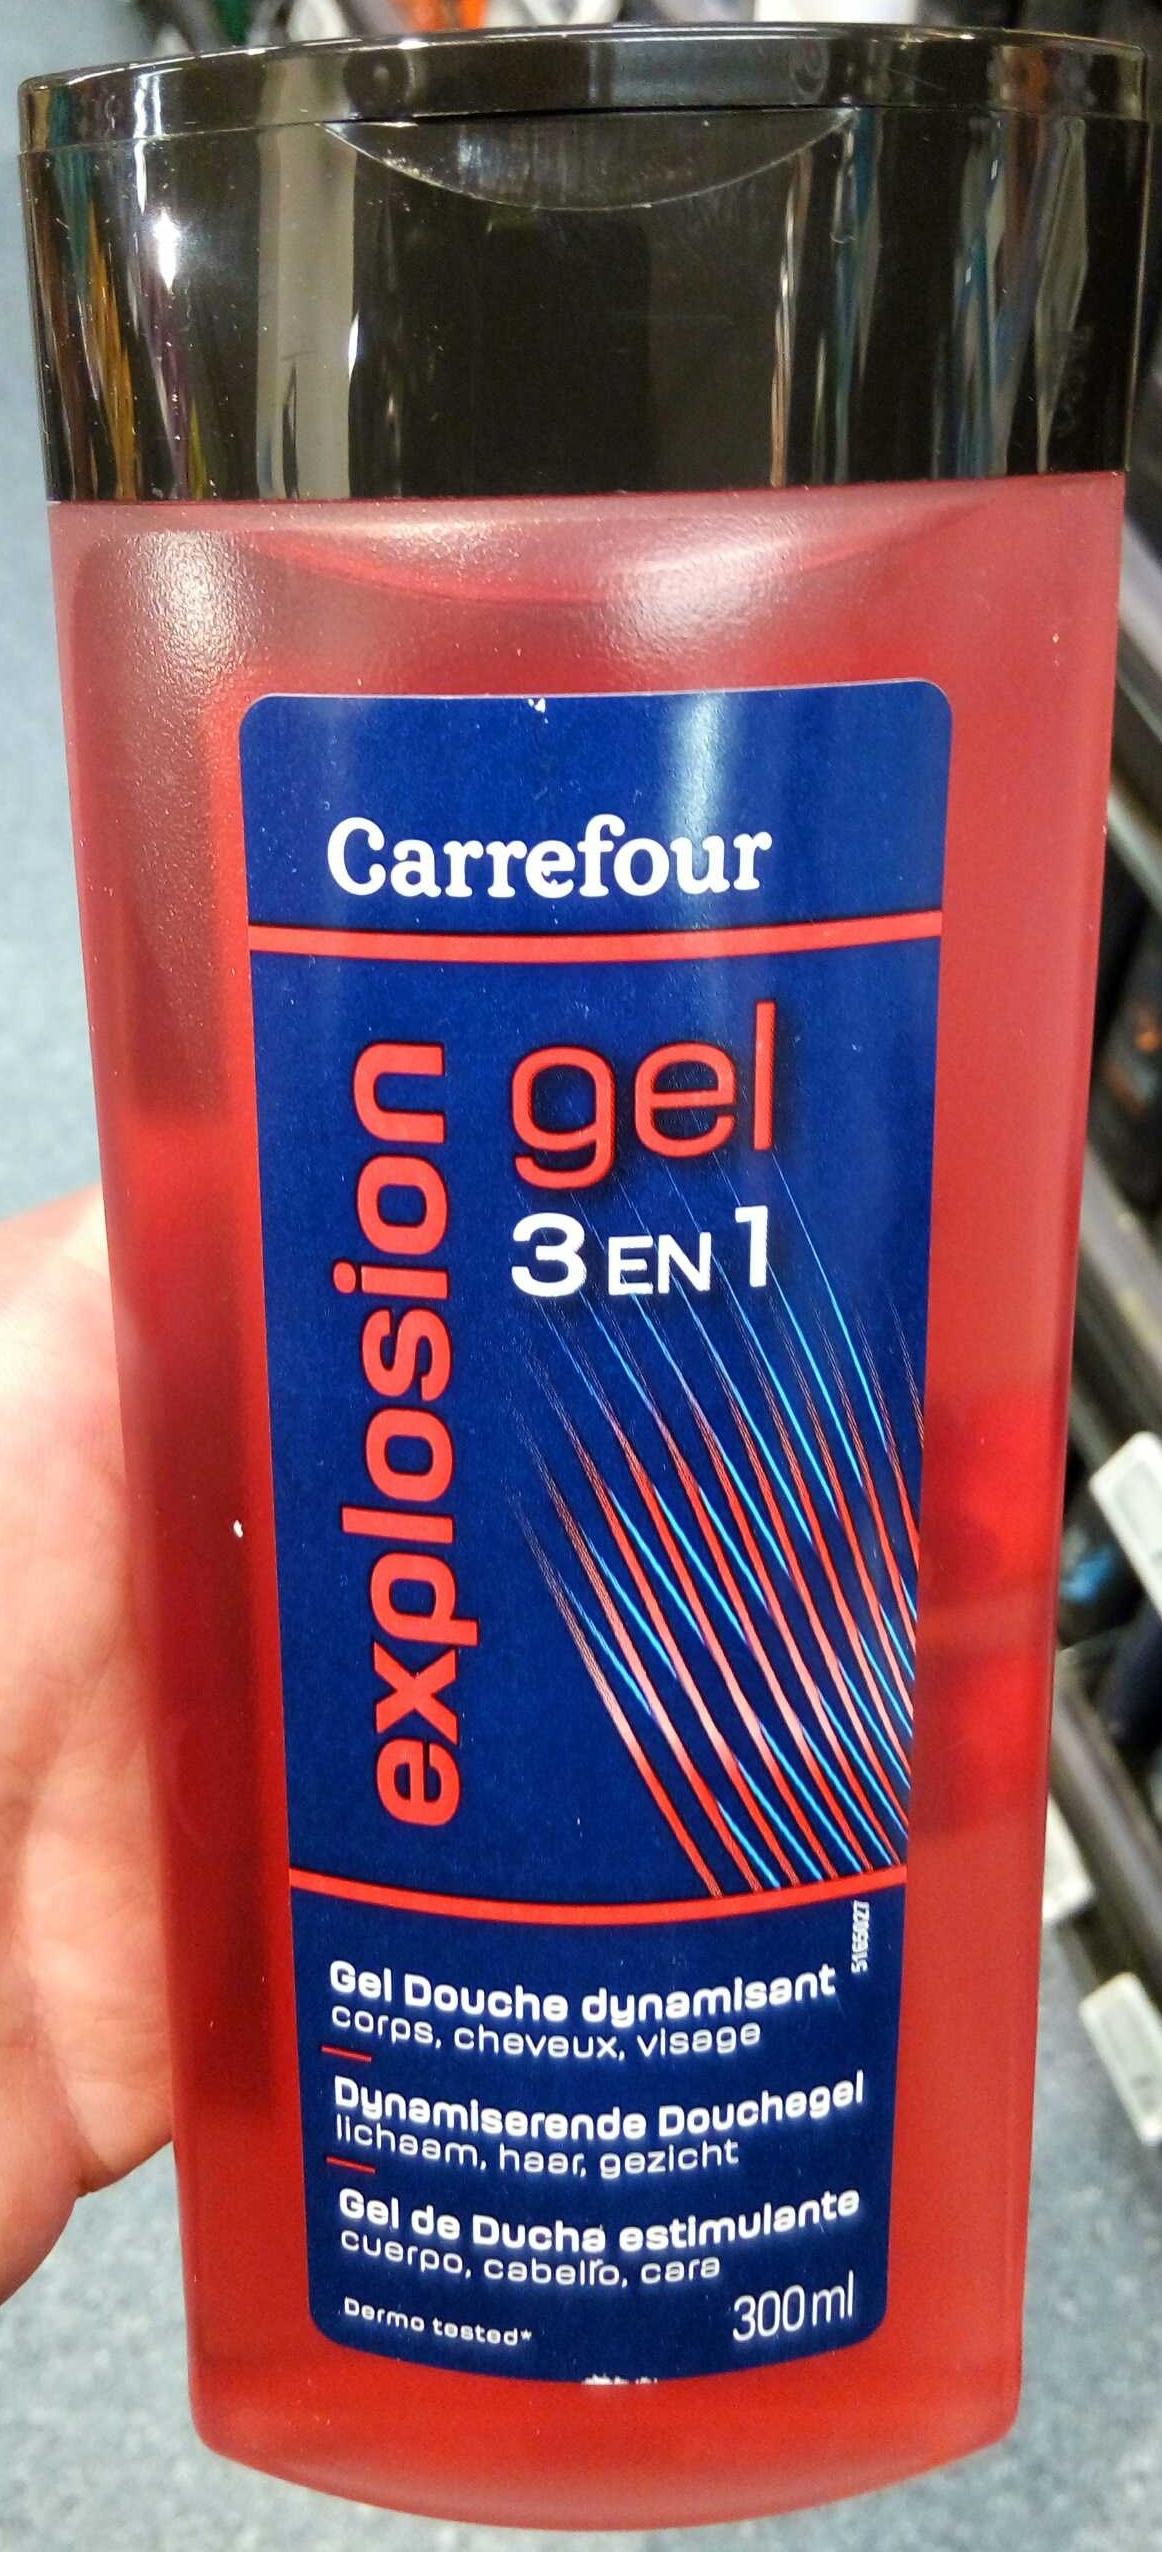 Explosion Gel 3 en 1 - Product - fr